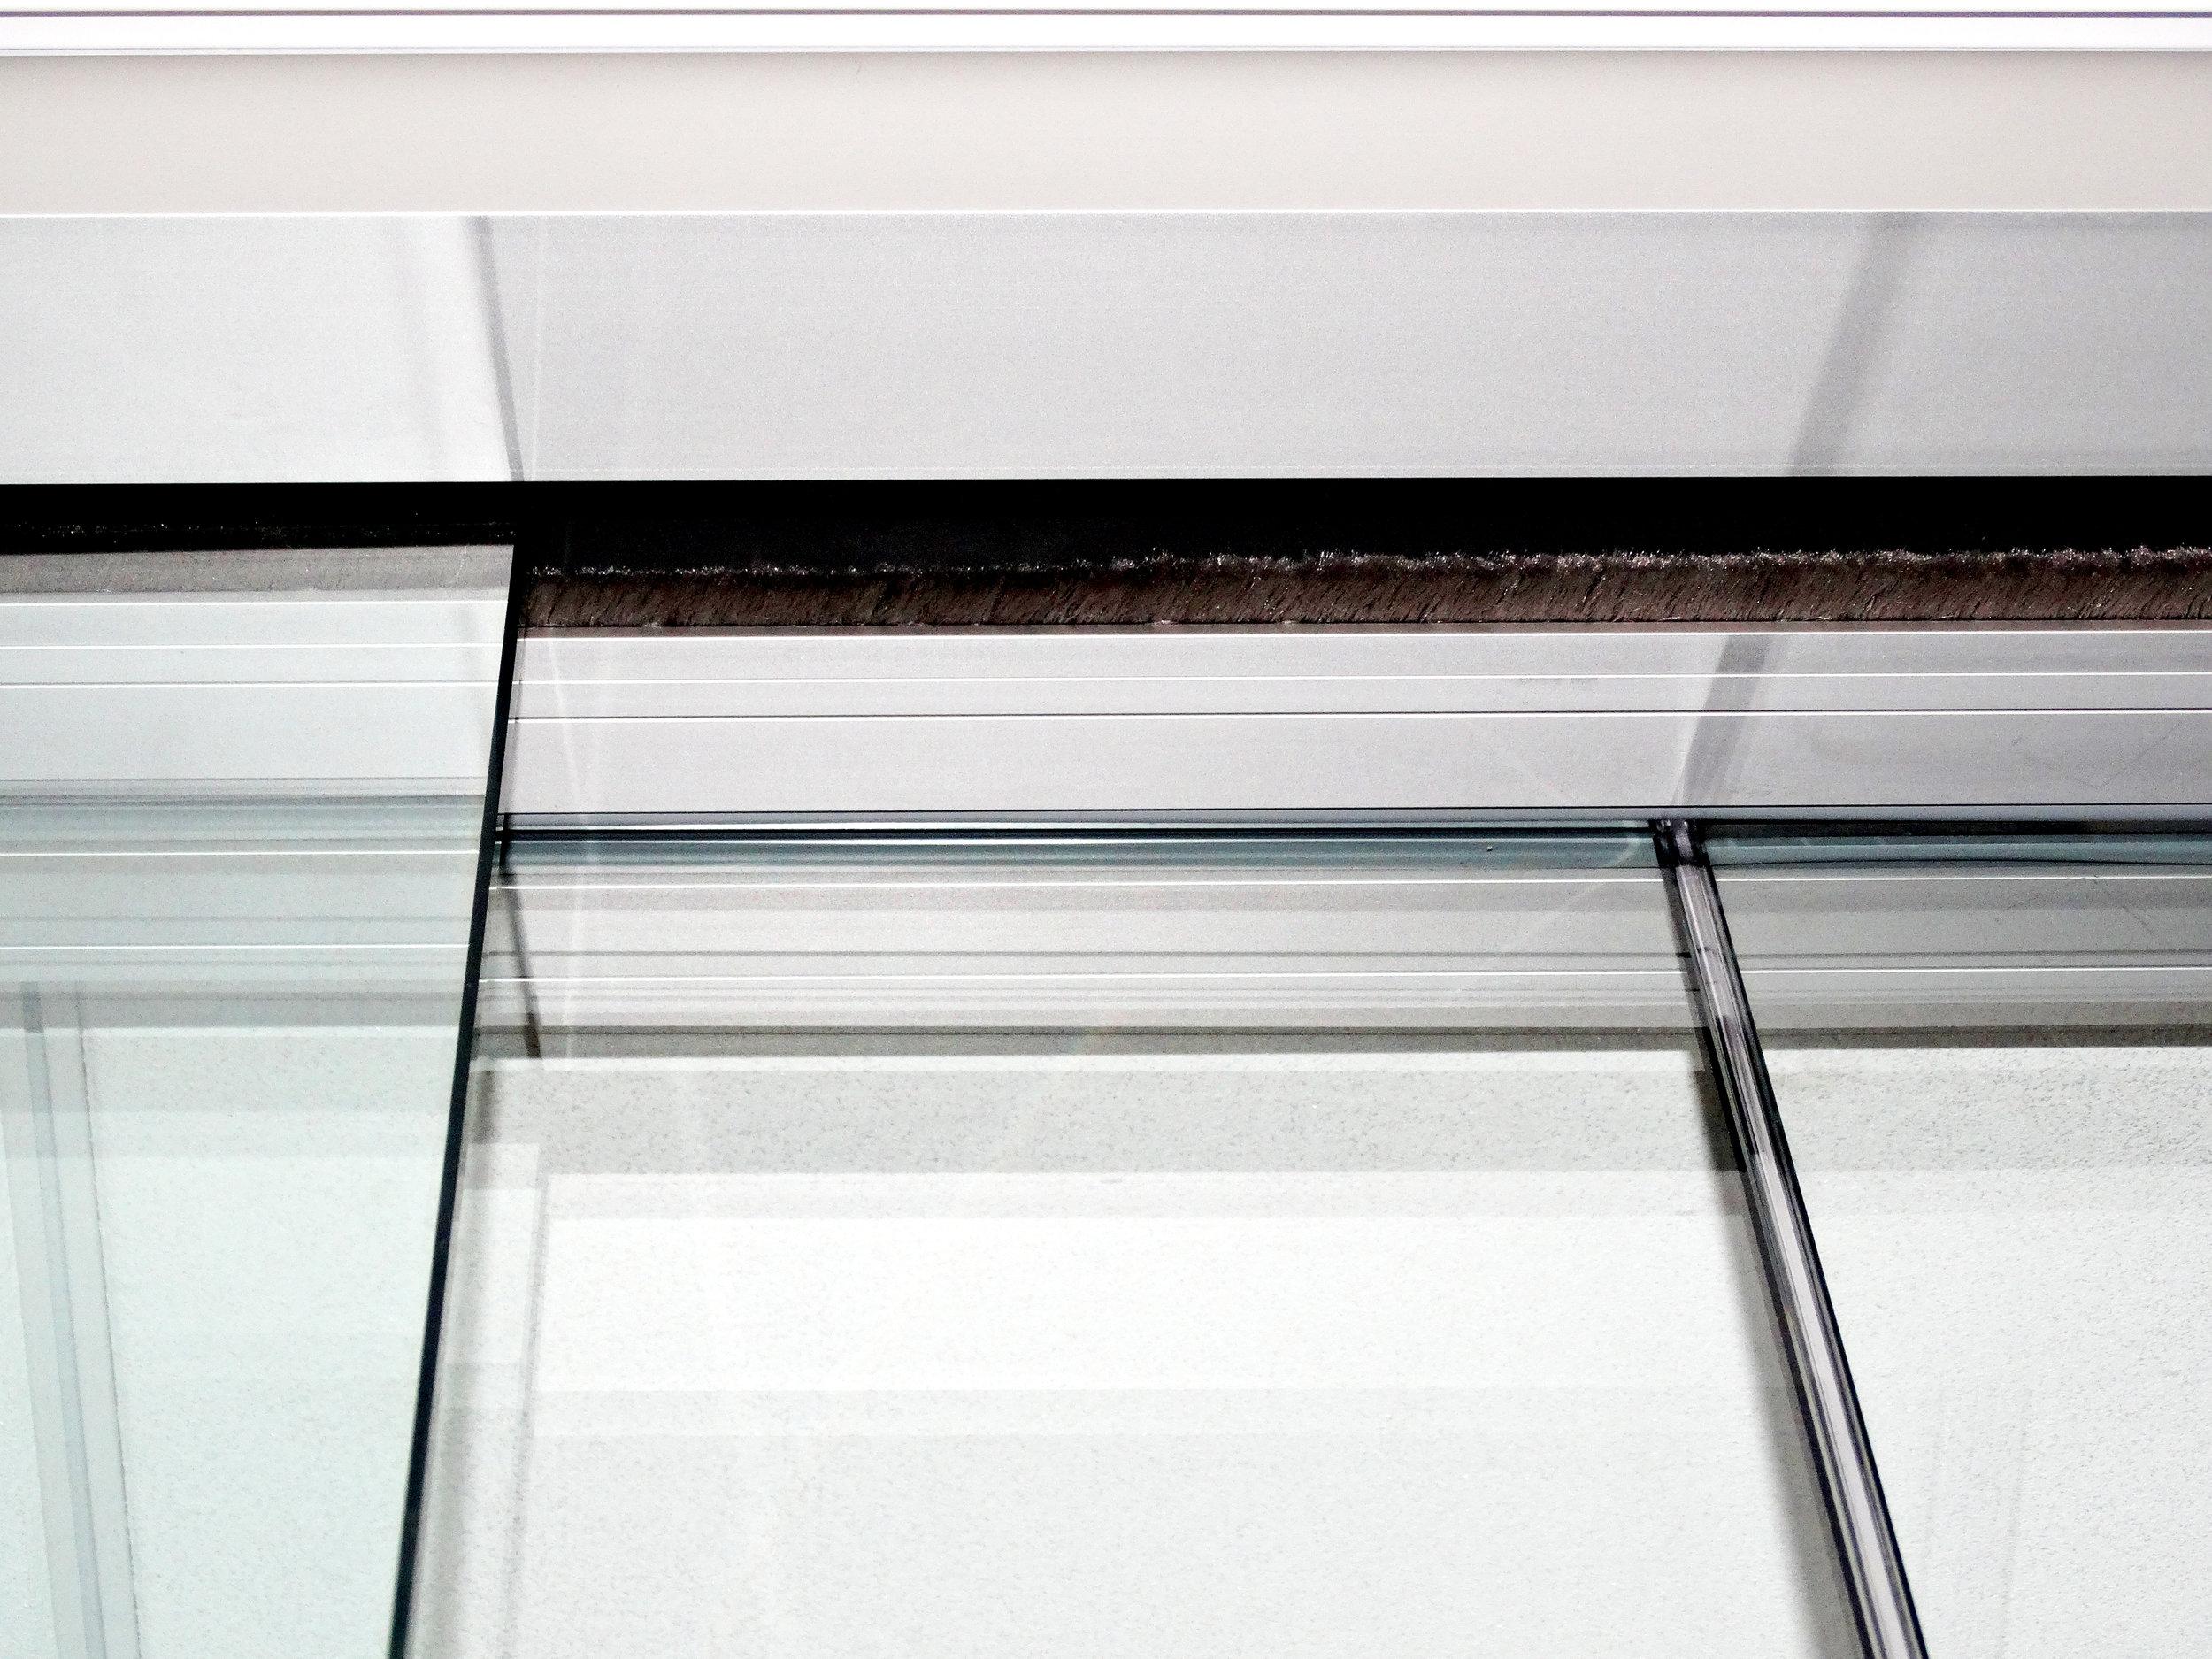 Litespace Sliding Glass Door Track Detail - Spaceworks AI.jpg